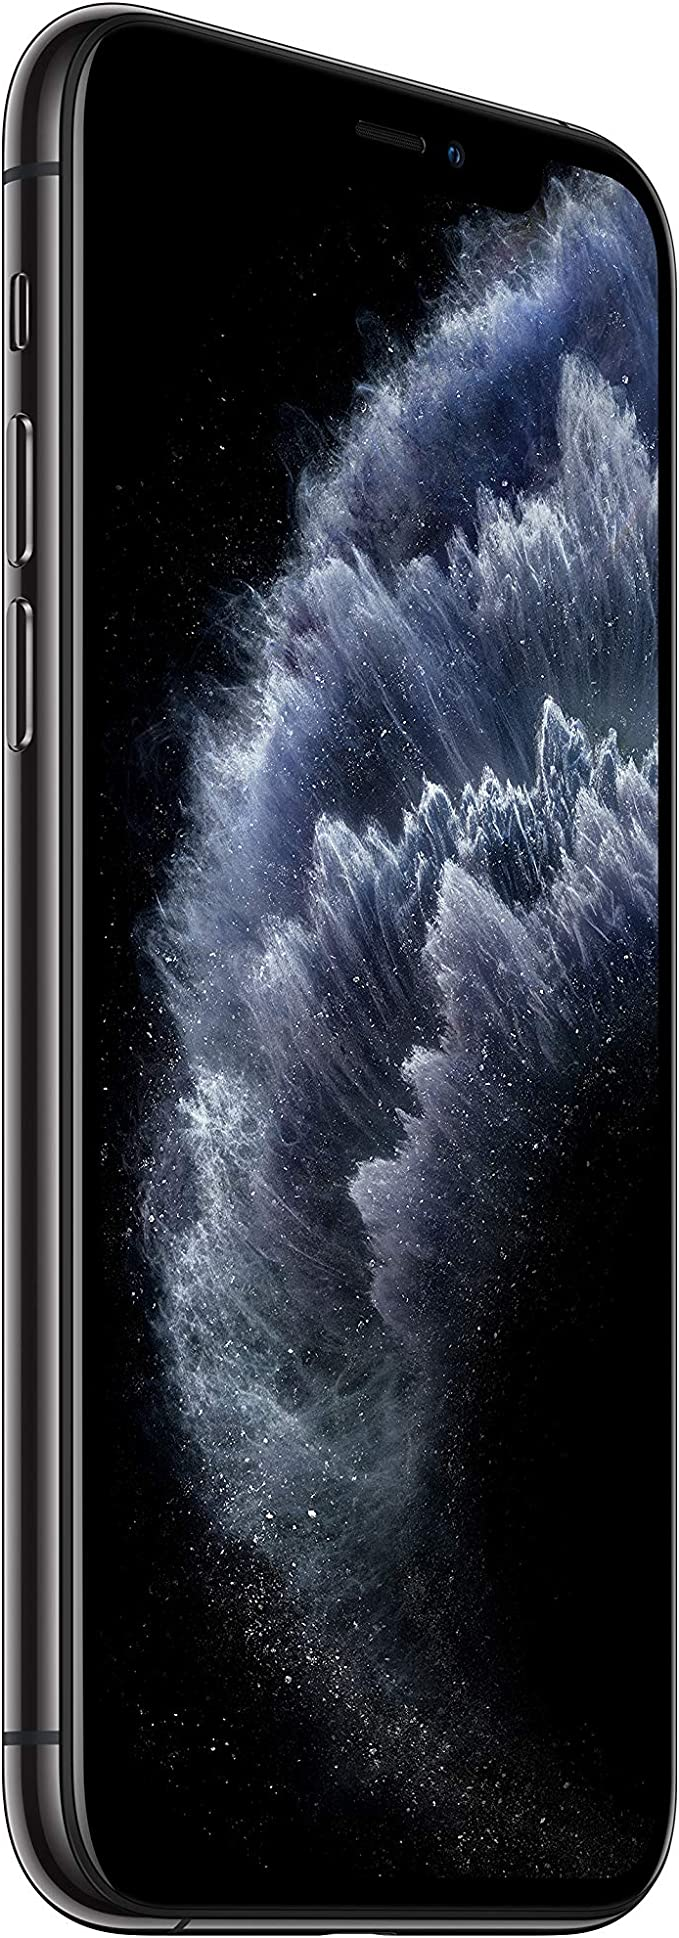 Apple iPhone 11 Pro (64 GB) - Gris Espacial: Apple: Amazon.es